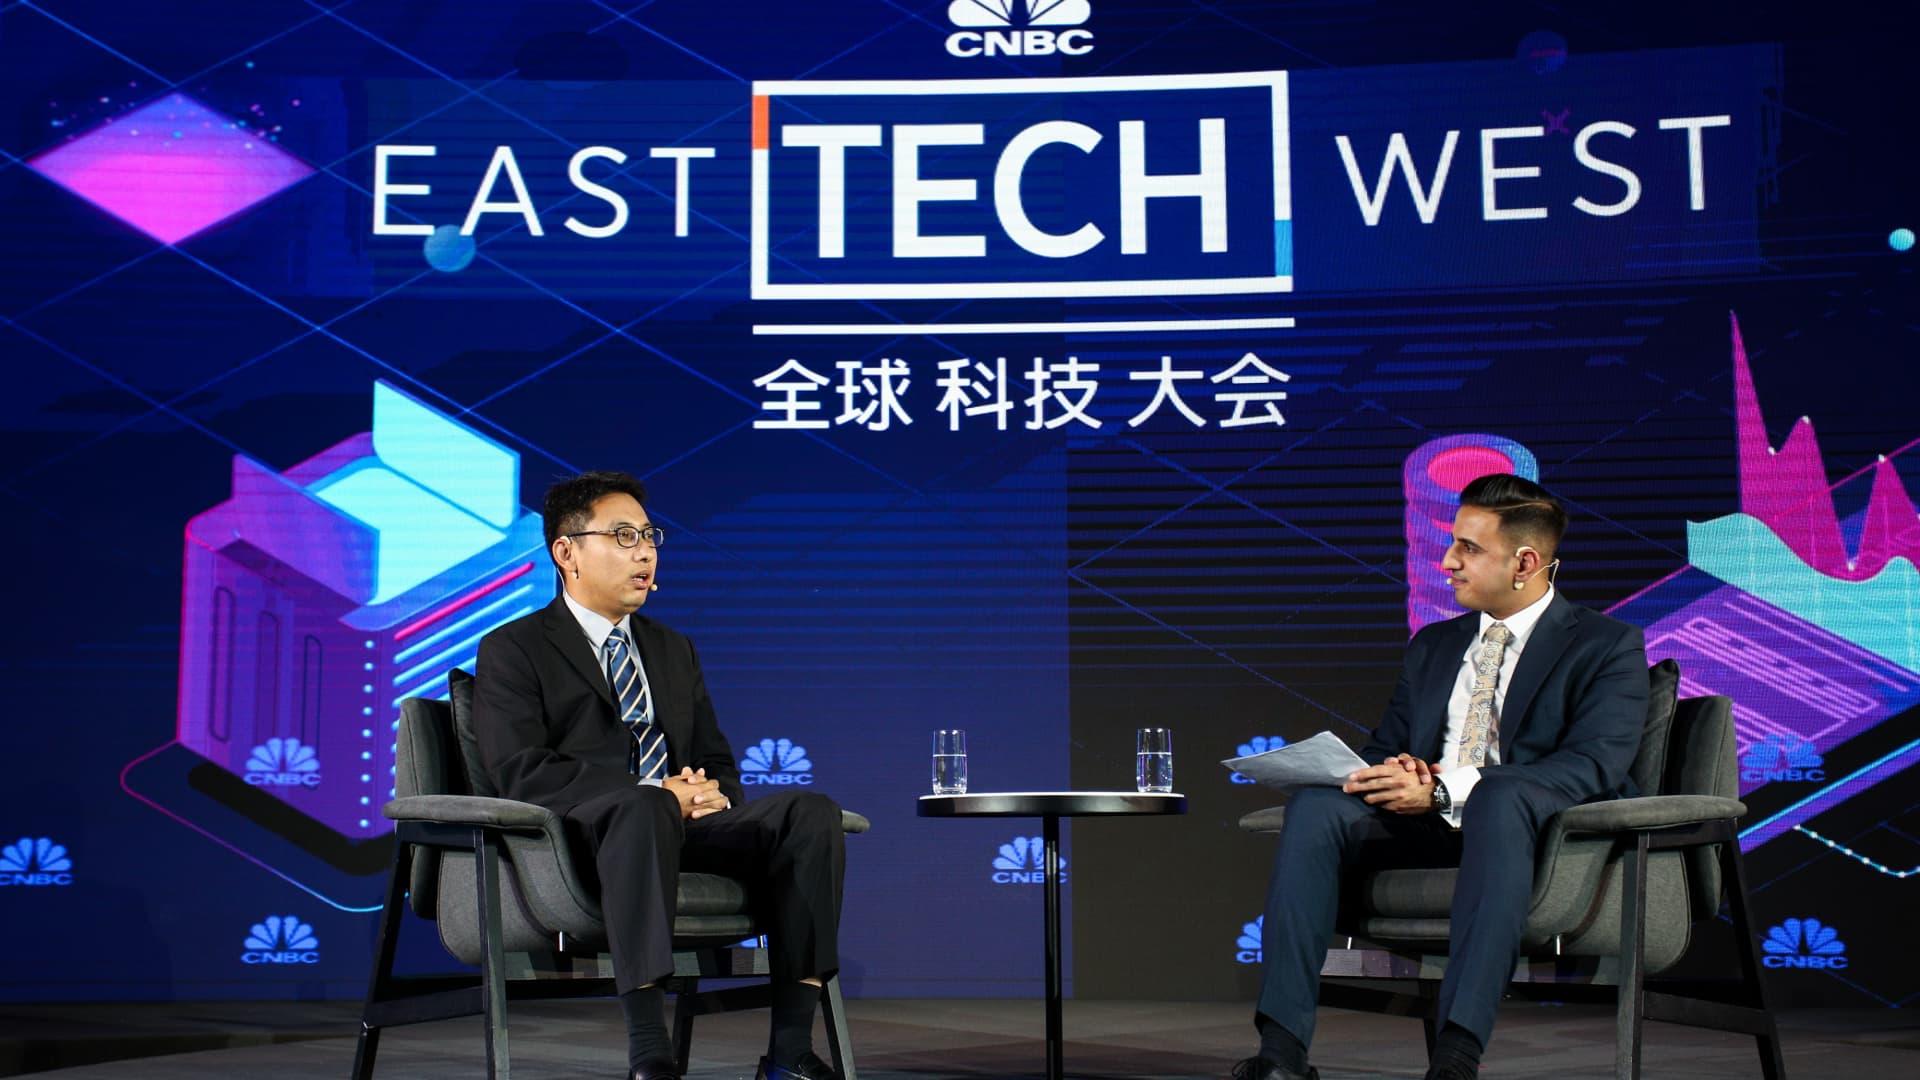 Liu Qiang, Vice President of Fosun Technology and Financial Group, Deputy Chairman of Hani Securities, speaks with Arjun Kharpal, Senior Correspondent of CNBC, during Day 1 of CNBC East Tech West at LN Garden Hotel Nansha Guangzhou on November 17, 2020 in Nansha, Guangzhou, China.